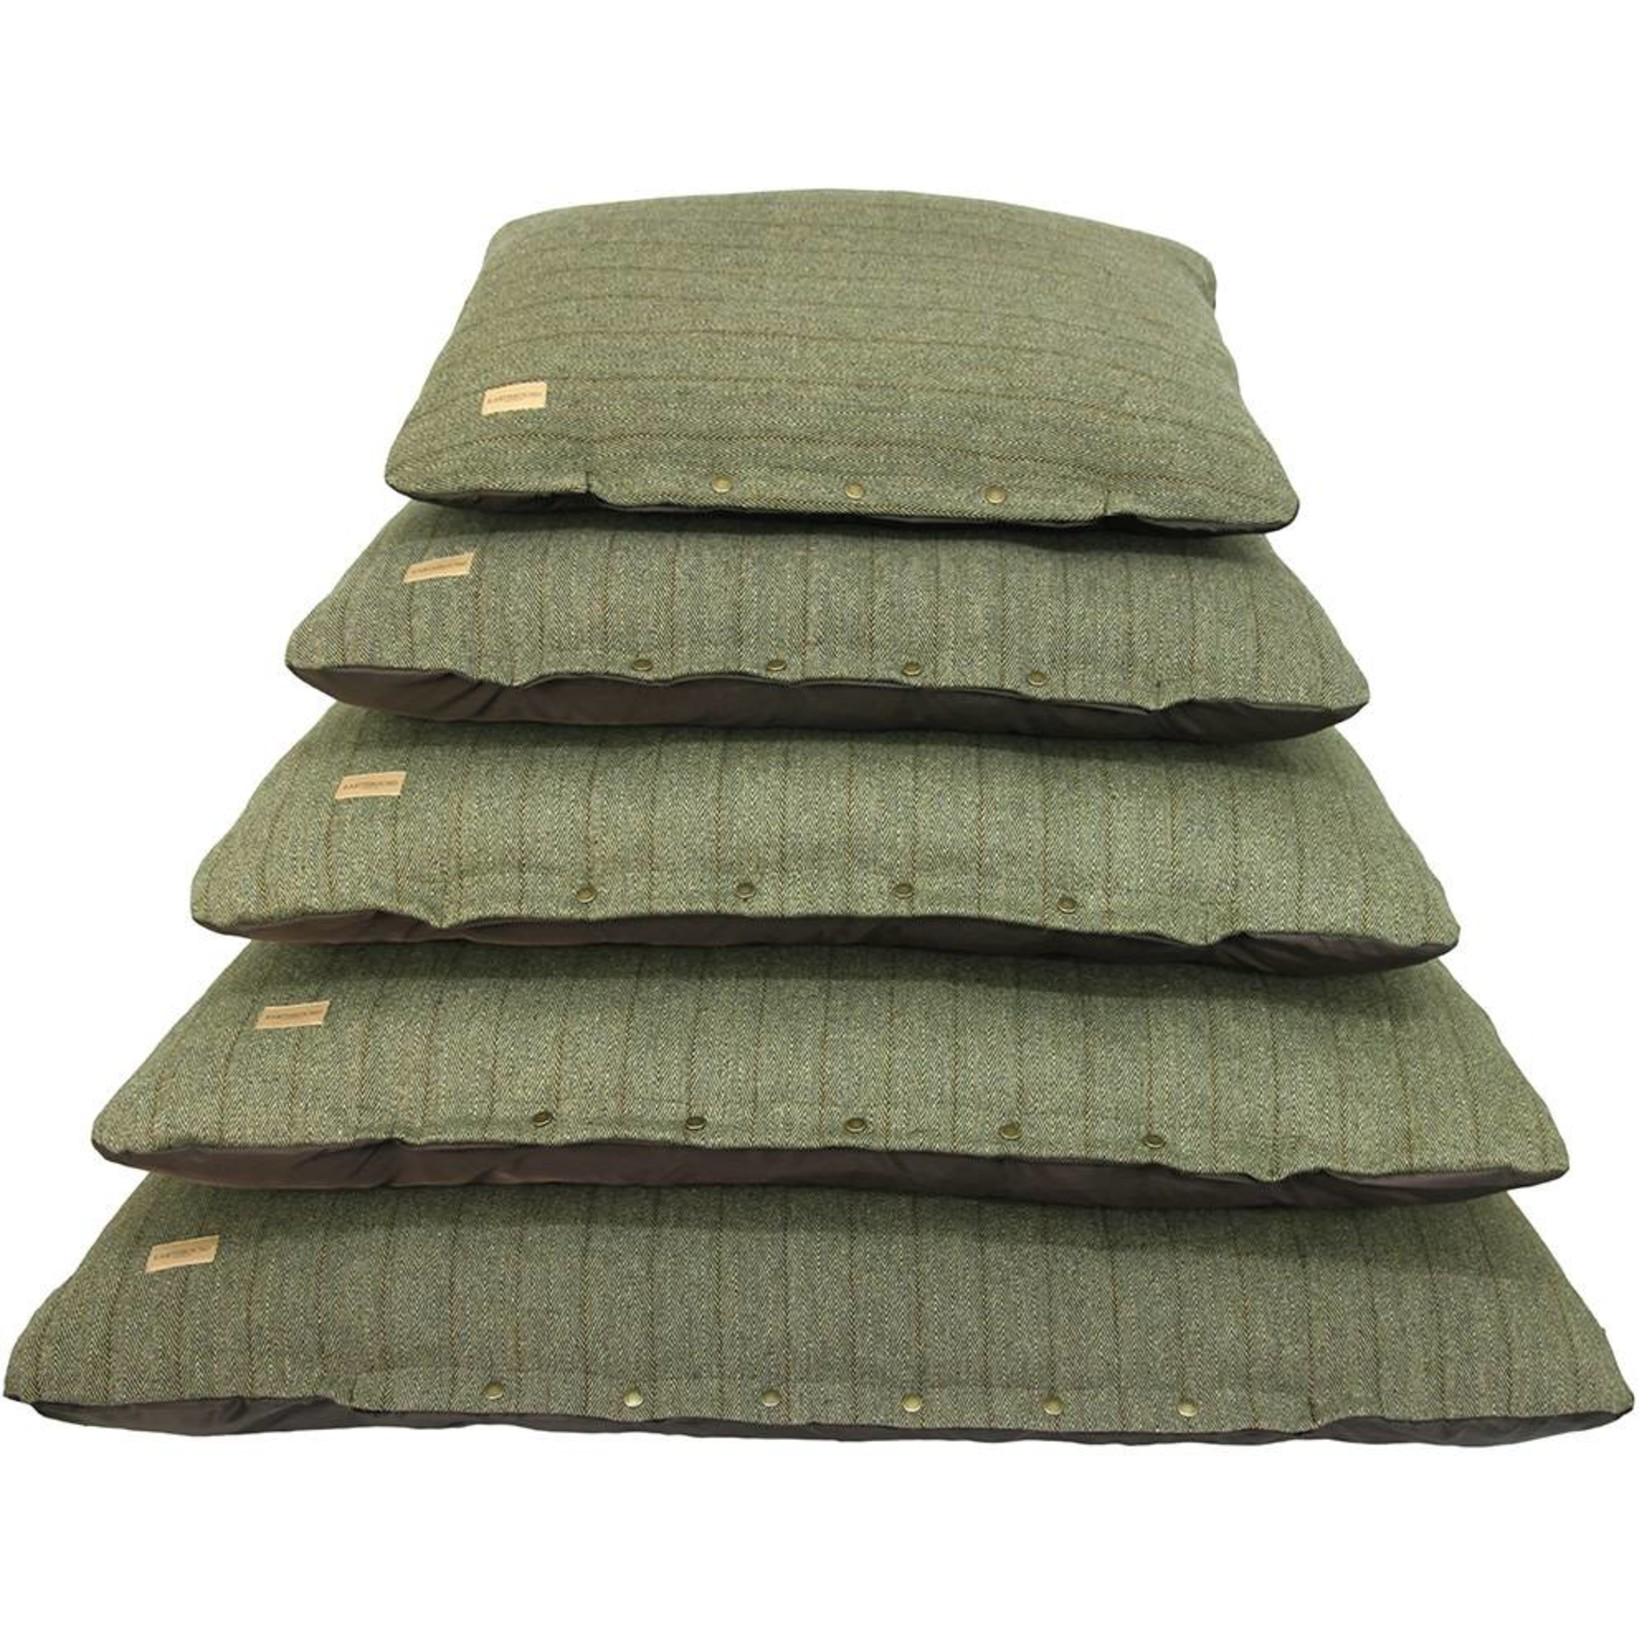 Earthbound Tweed Flat Pet Cushion, Green